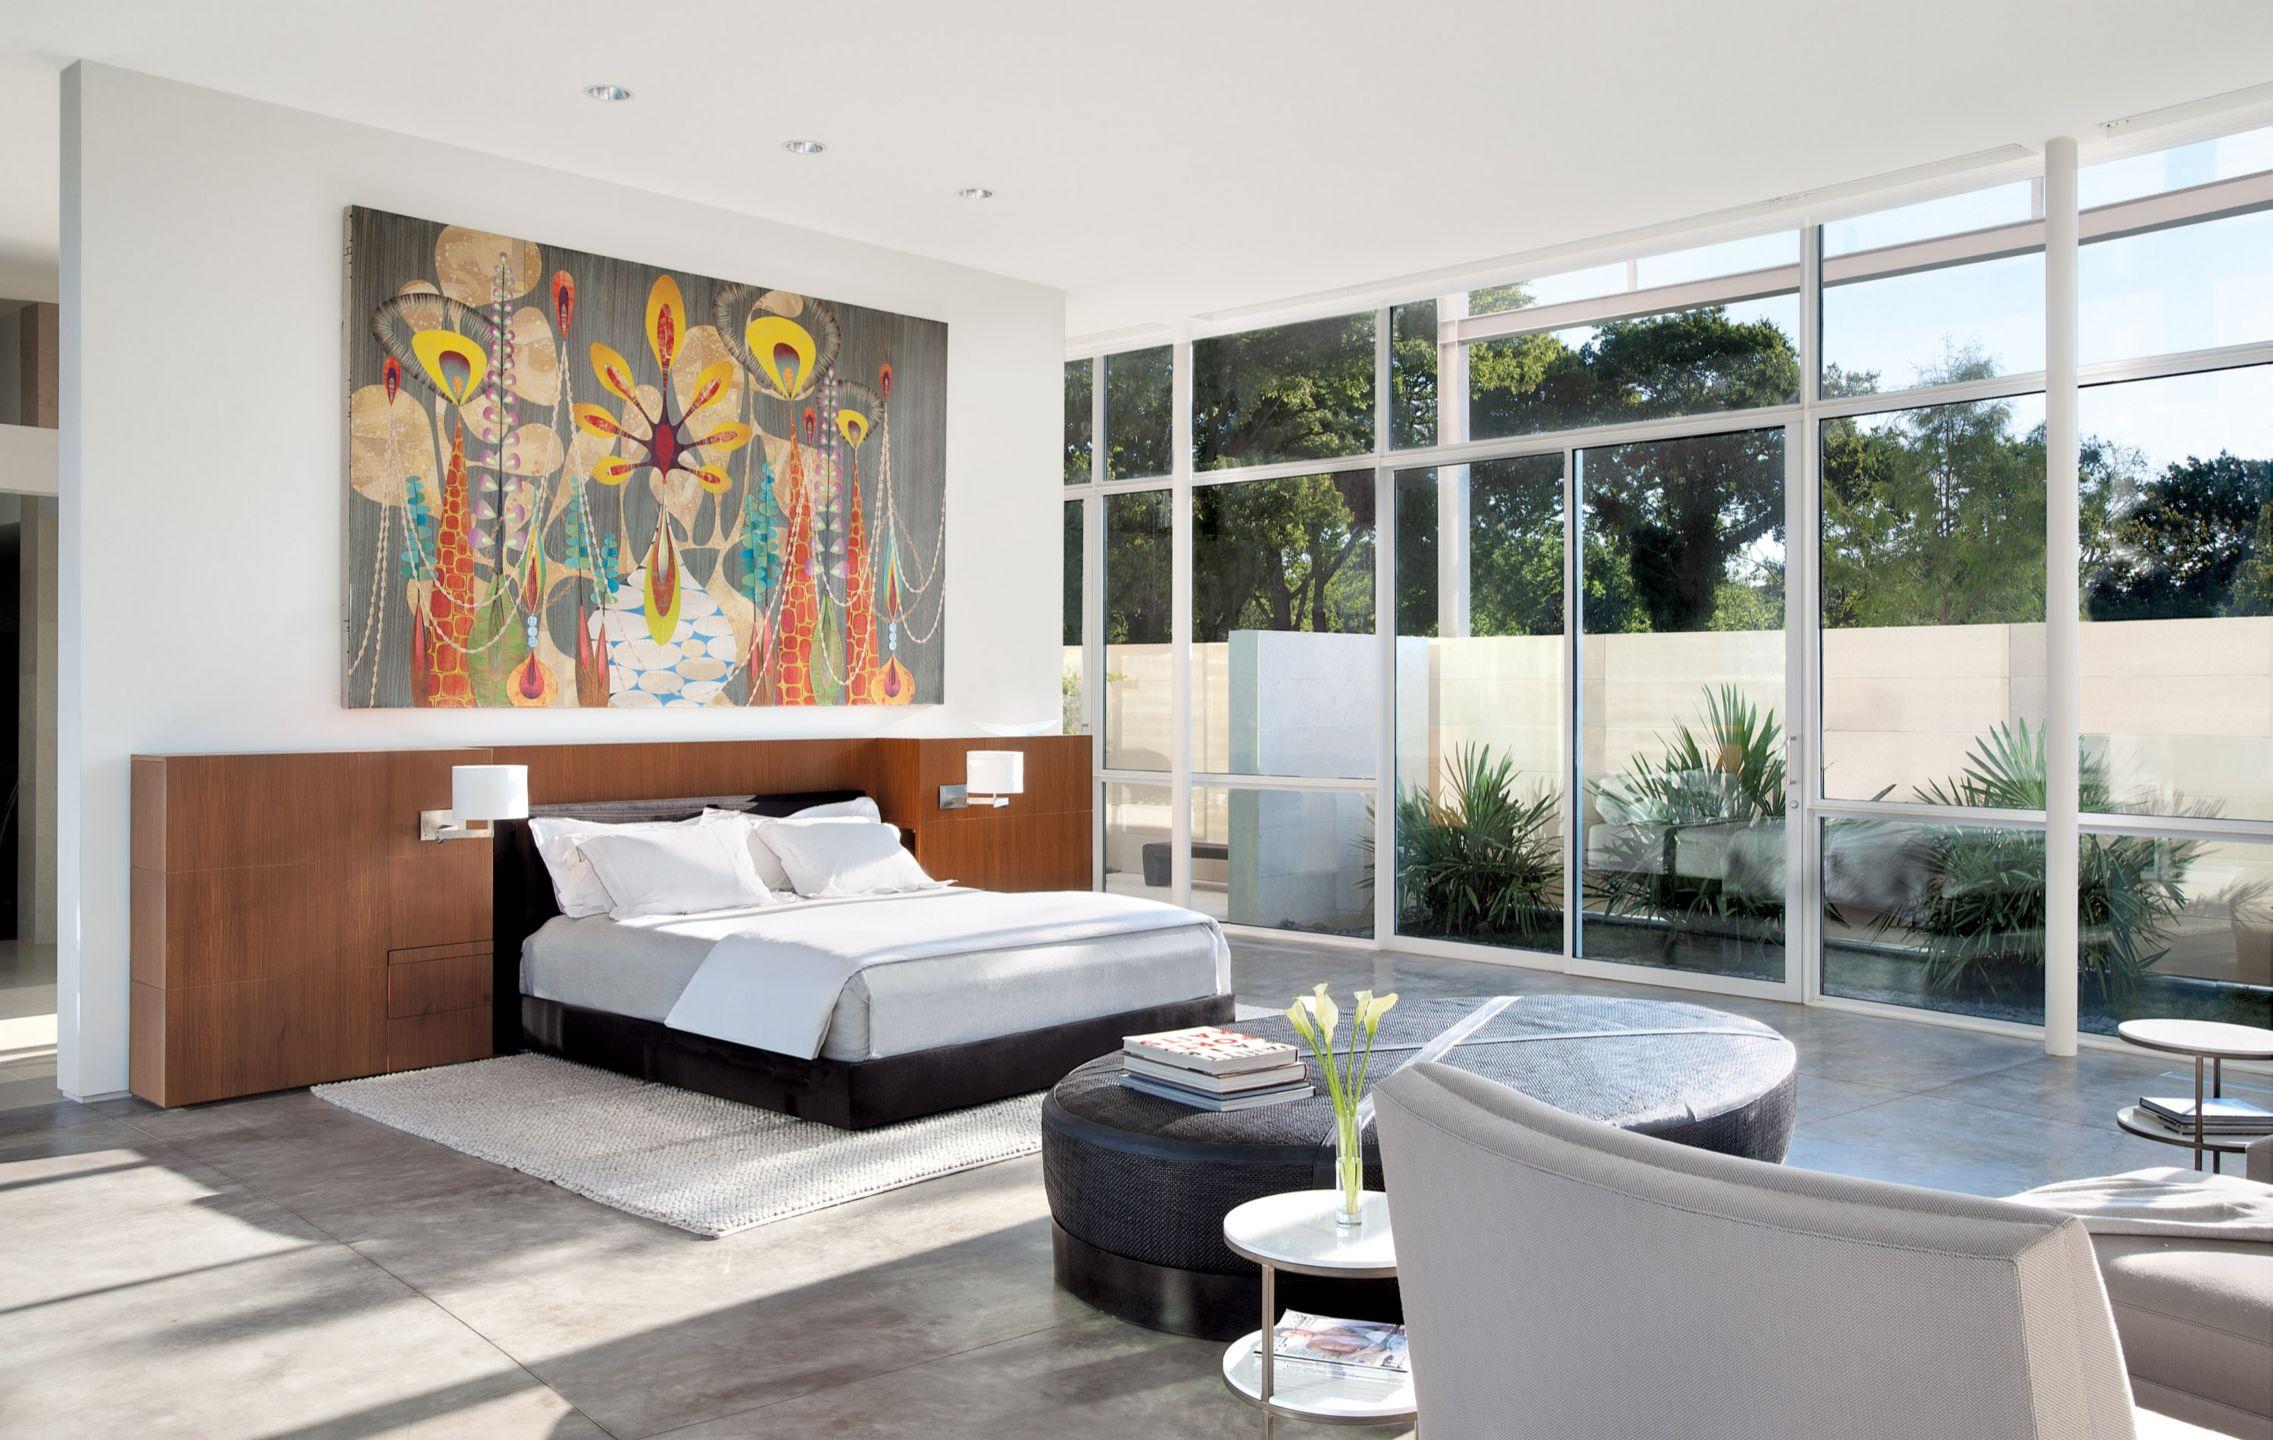 Modern White Bedroom with Oversized Art